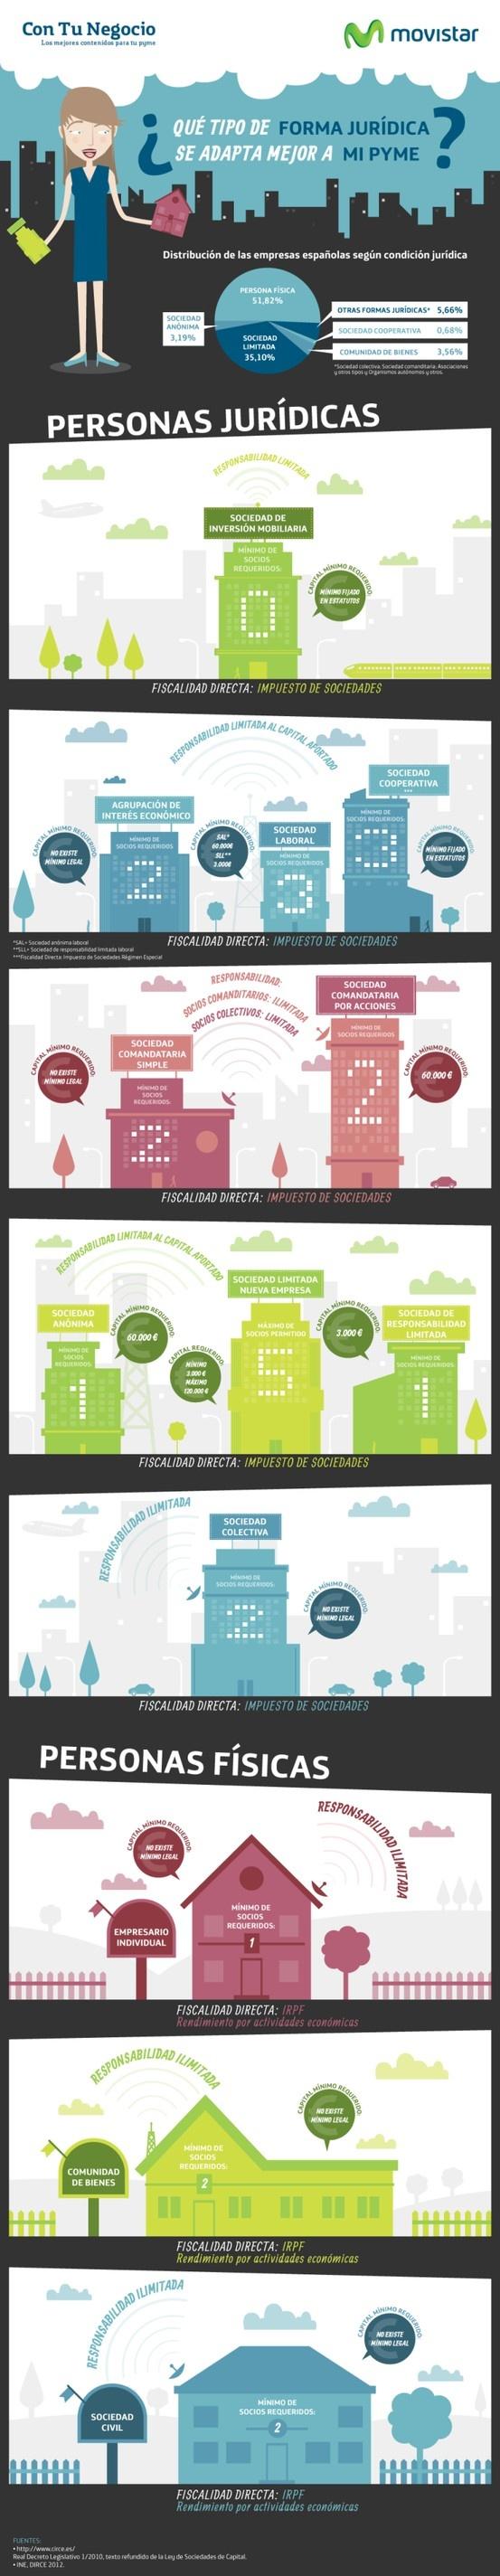 La mejor forma jurídica para tu pyme #infografia #infographic